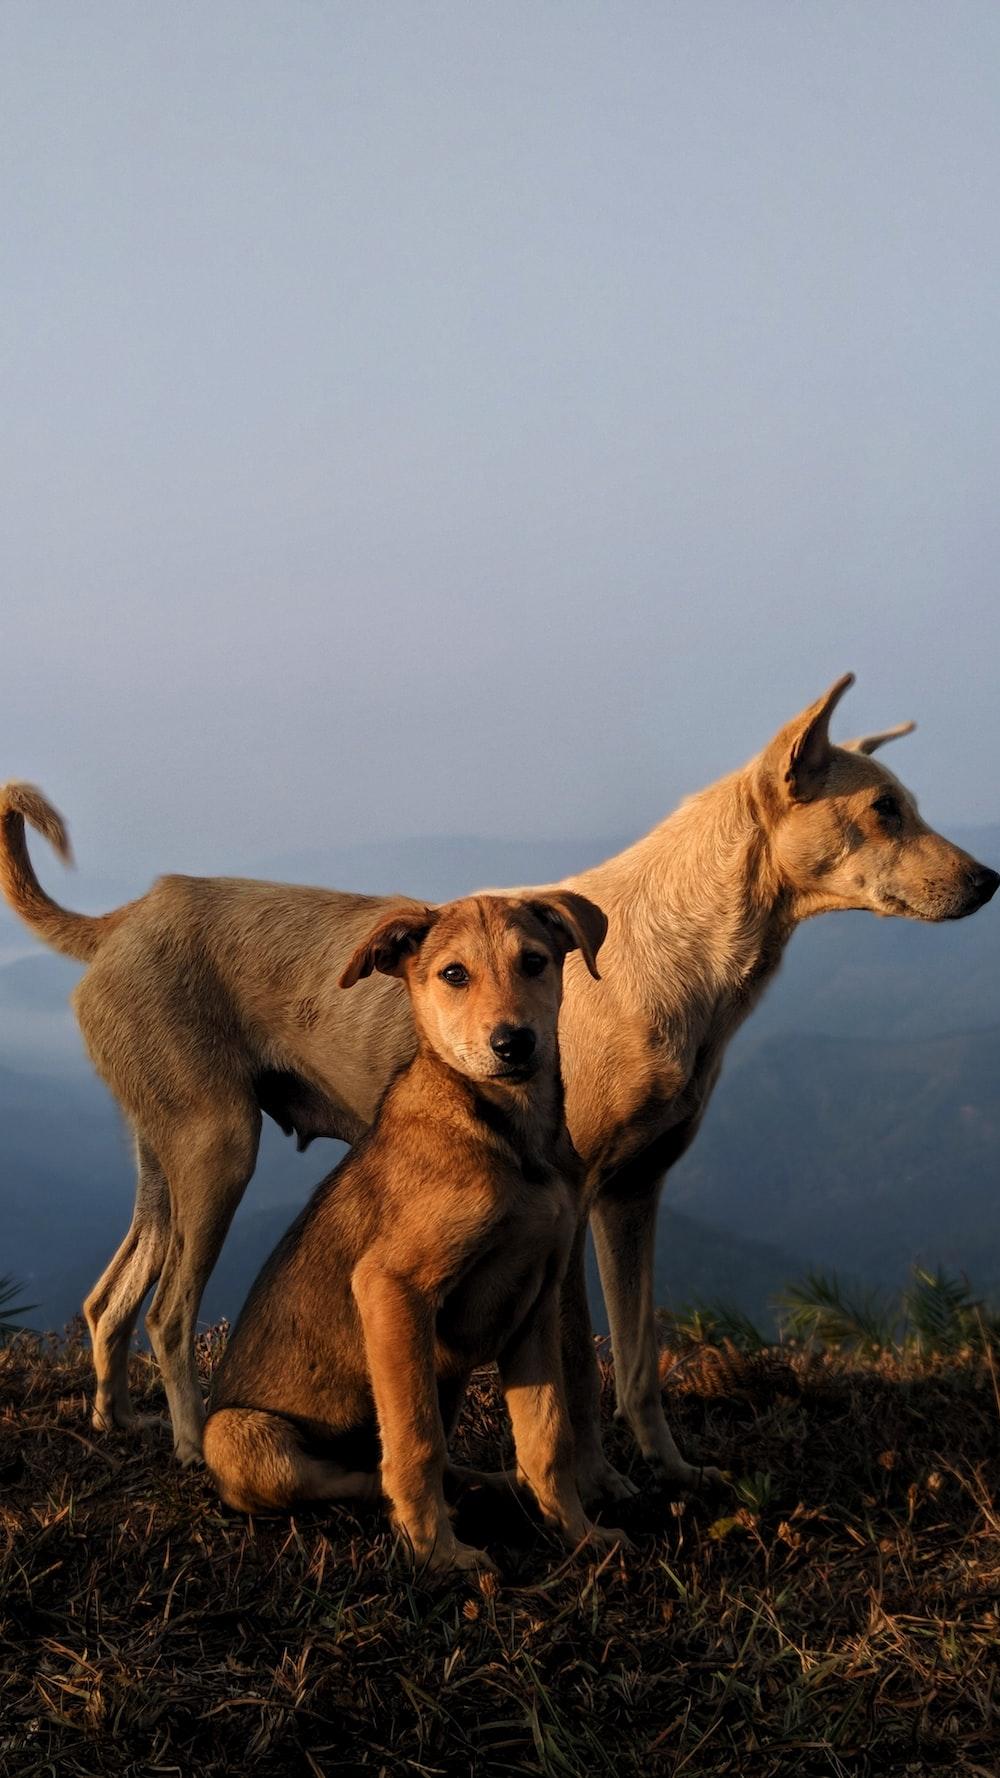 brown short coat medium dog on green grass field during daytime